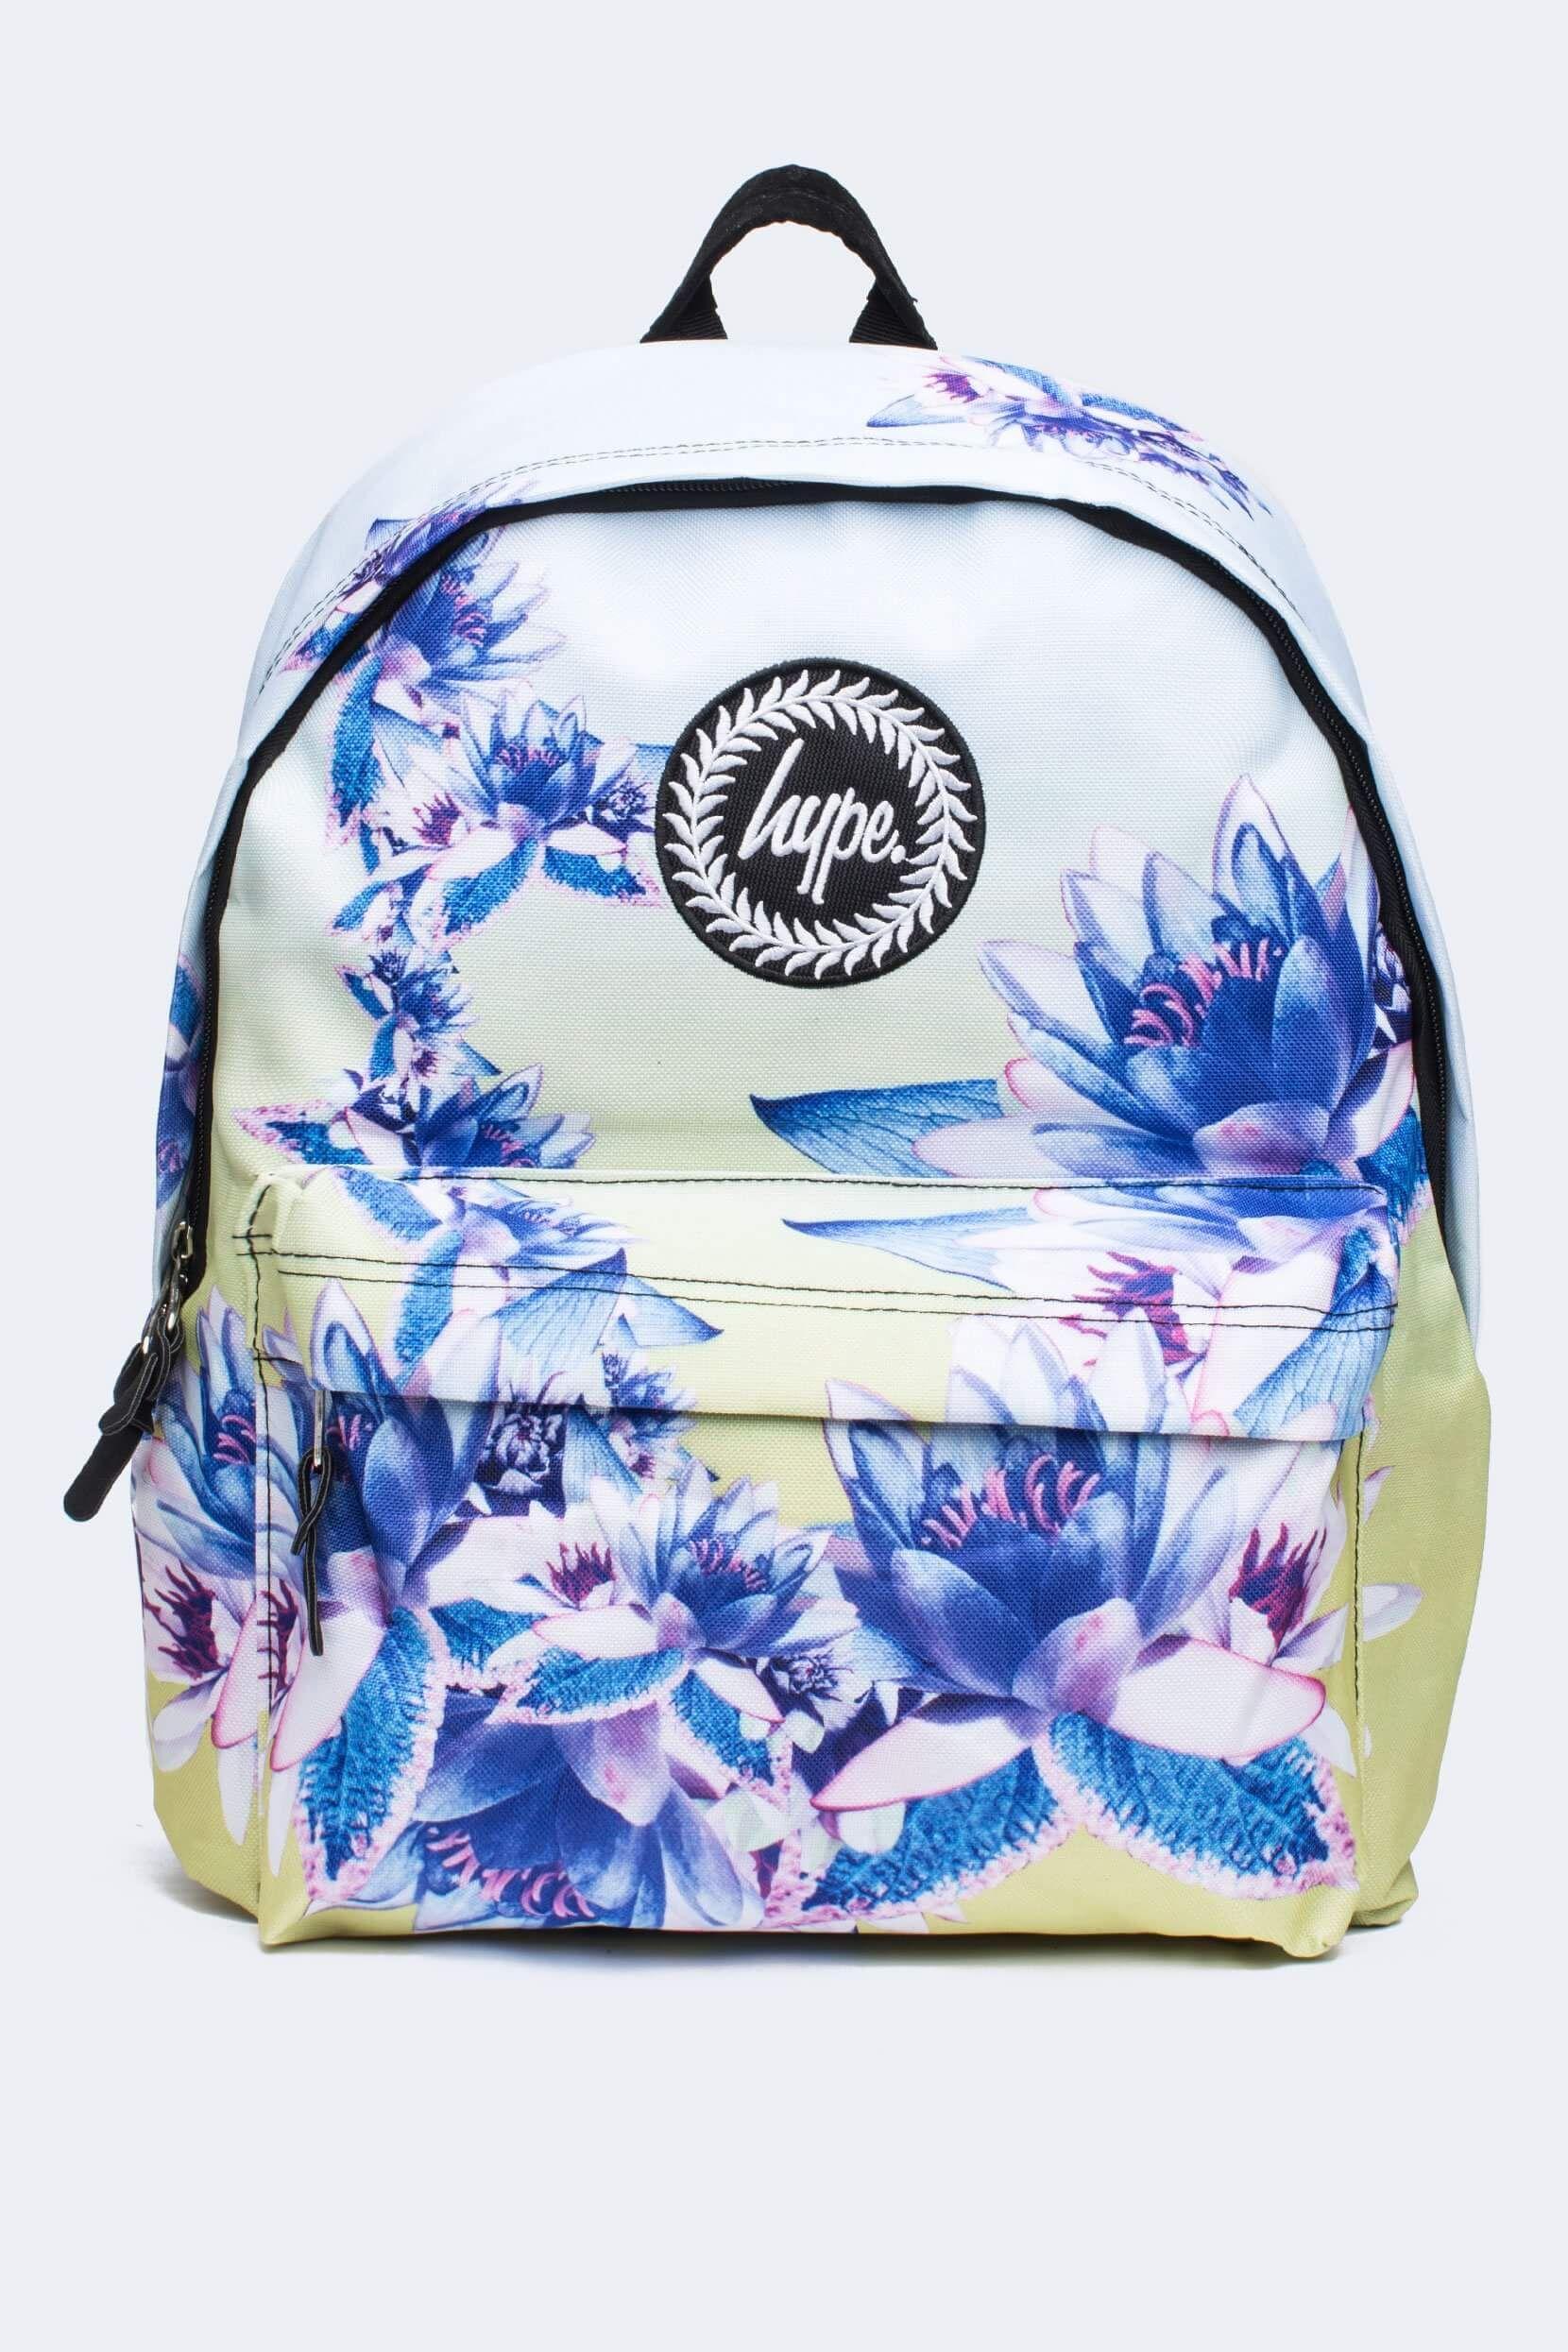 Hype Allover Floral Backpack